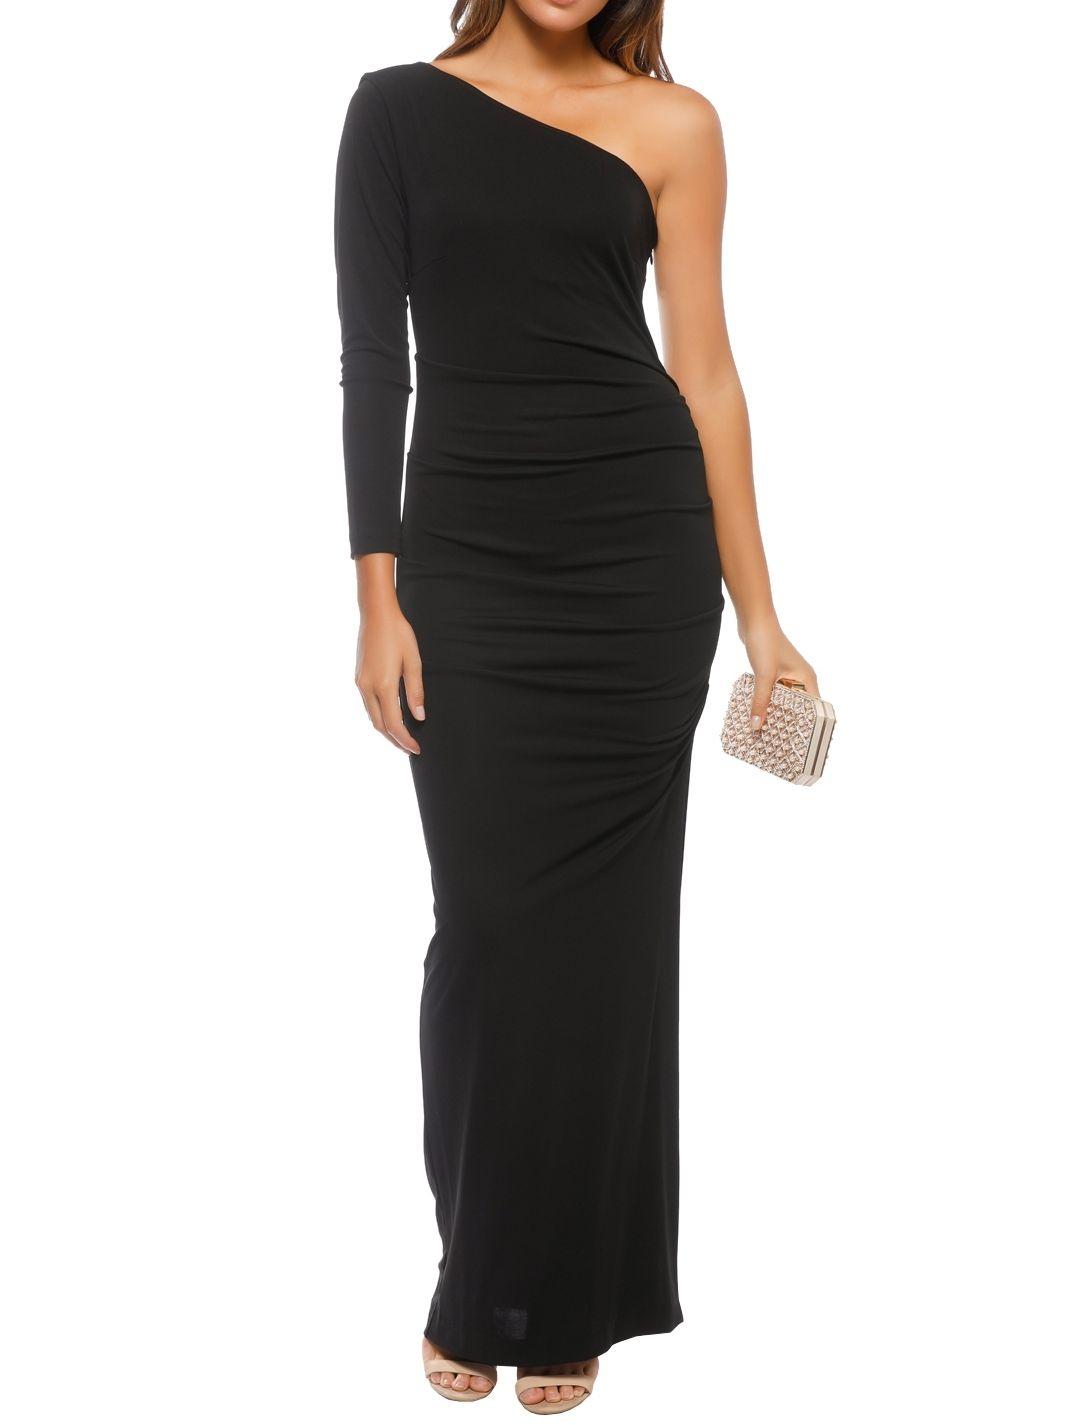 Nicole Miller - One Shoulder Gown - Black - Front